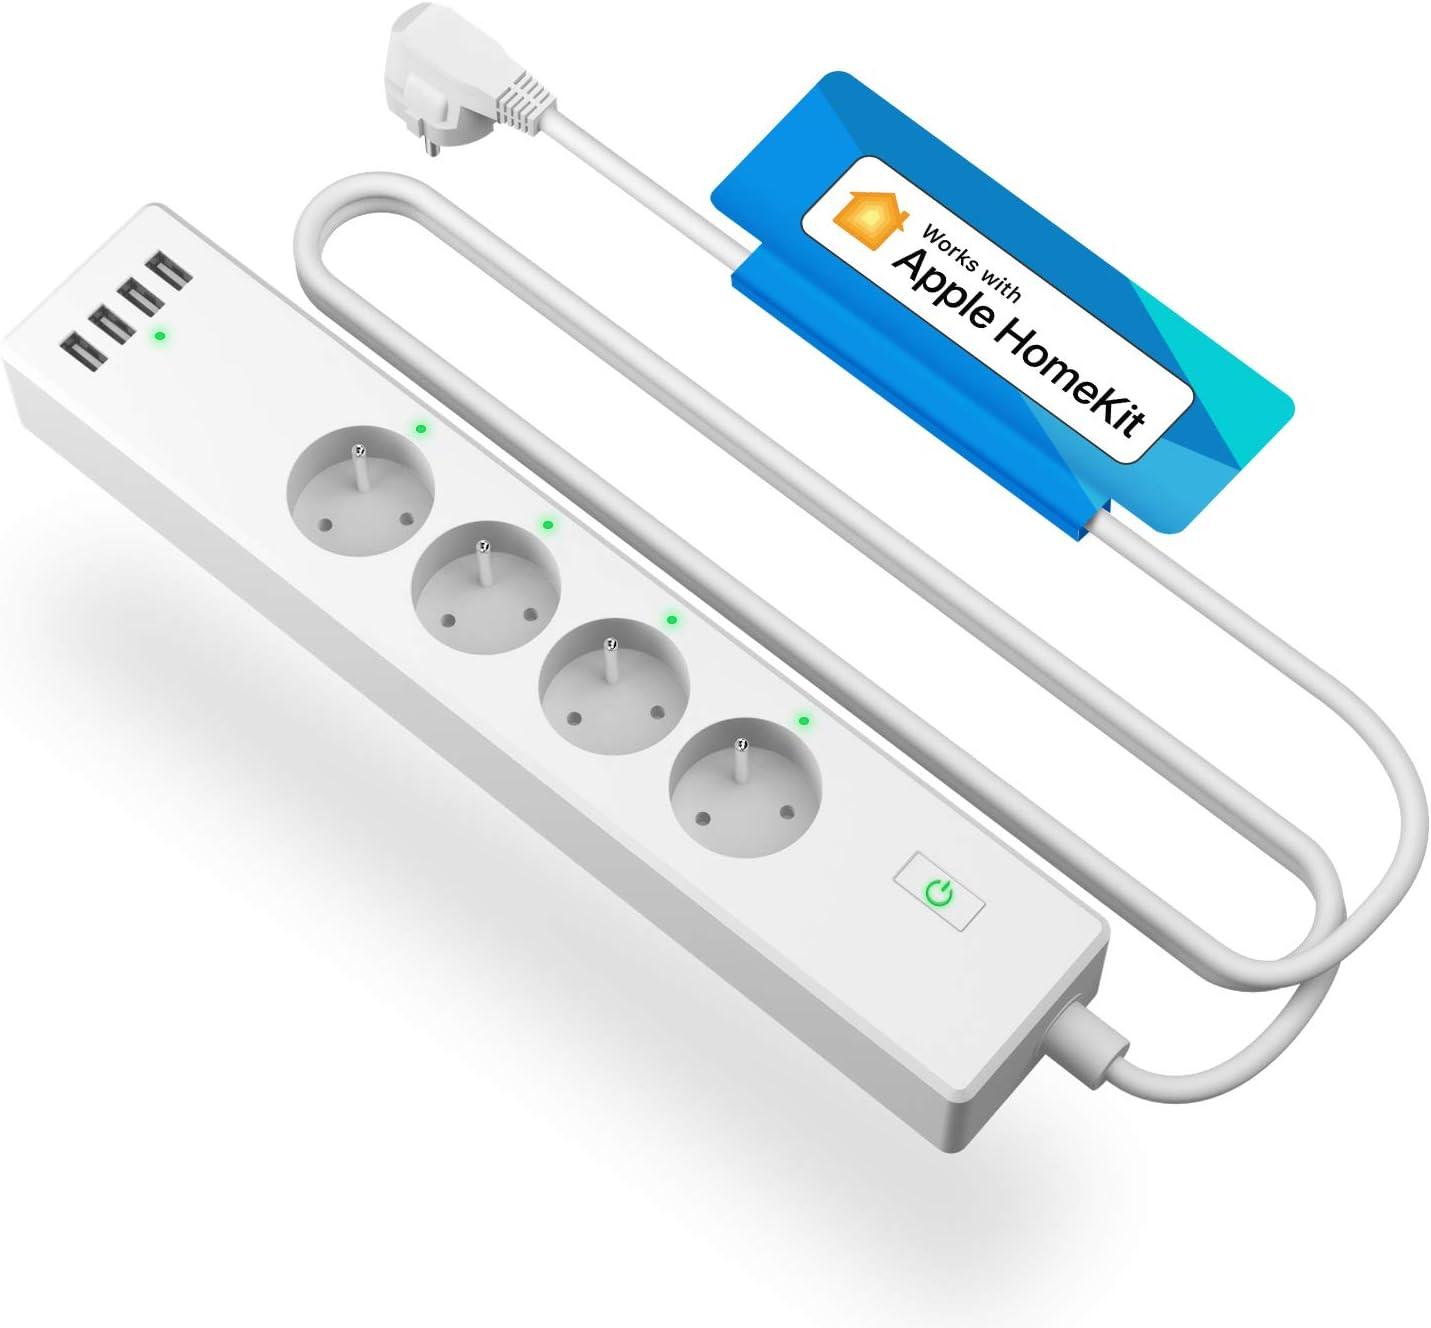 Multiprise Connectée HomeKit (FR), Multiprise Intelligente Compatible avec Apple HomeKit, Siri, Alexa,...